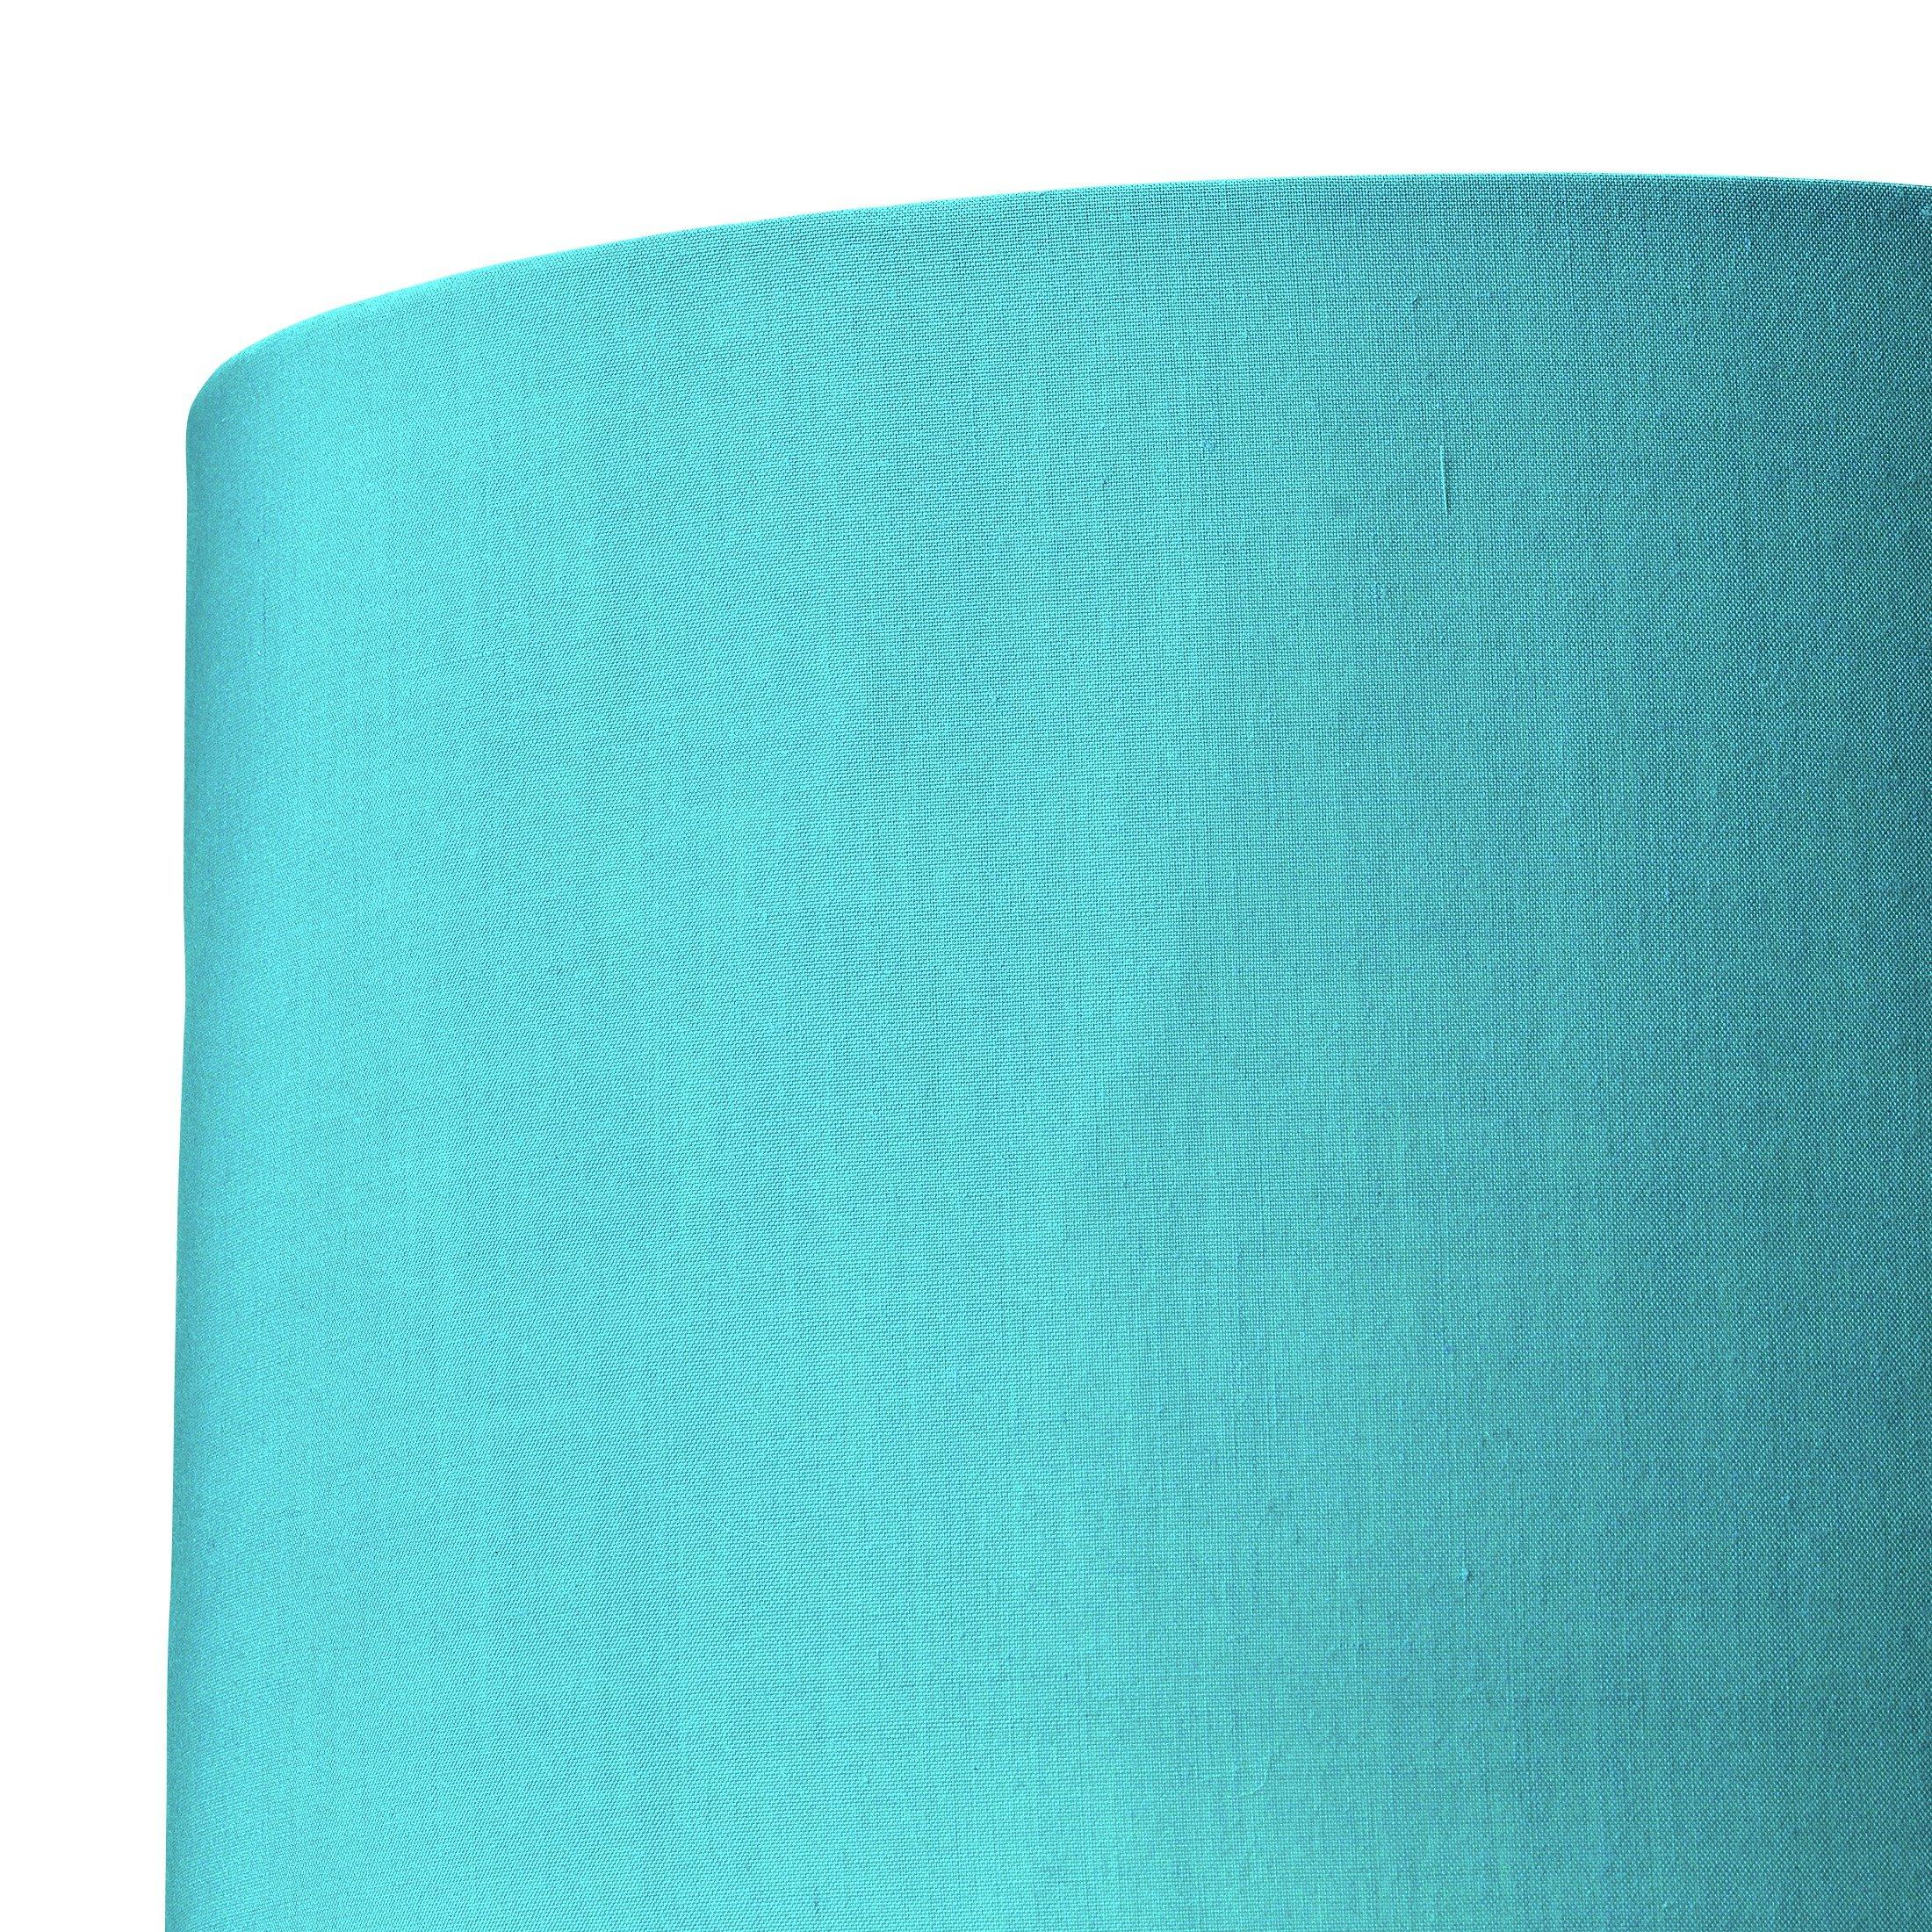 Argos Home Drum Light Shade - Teal